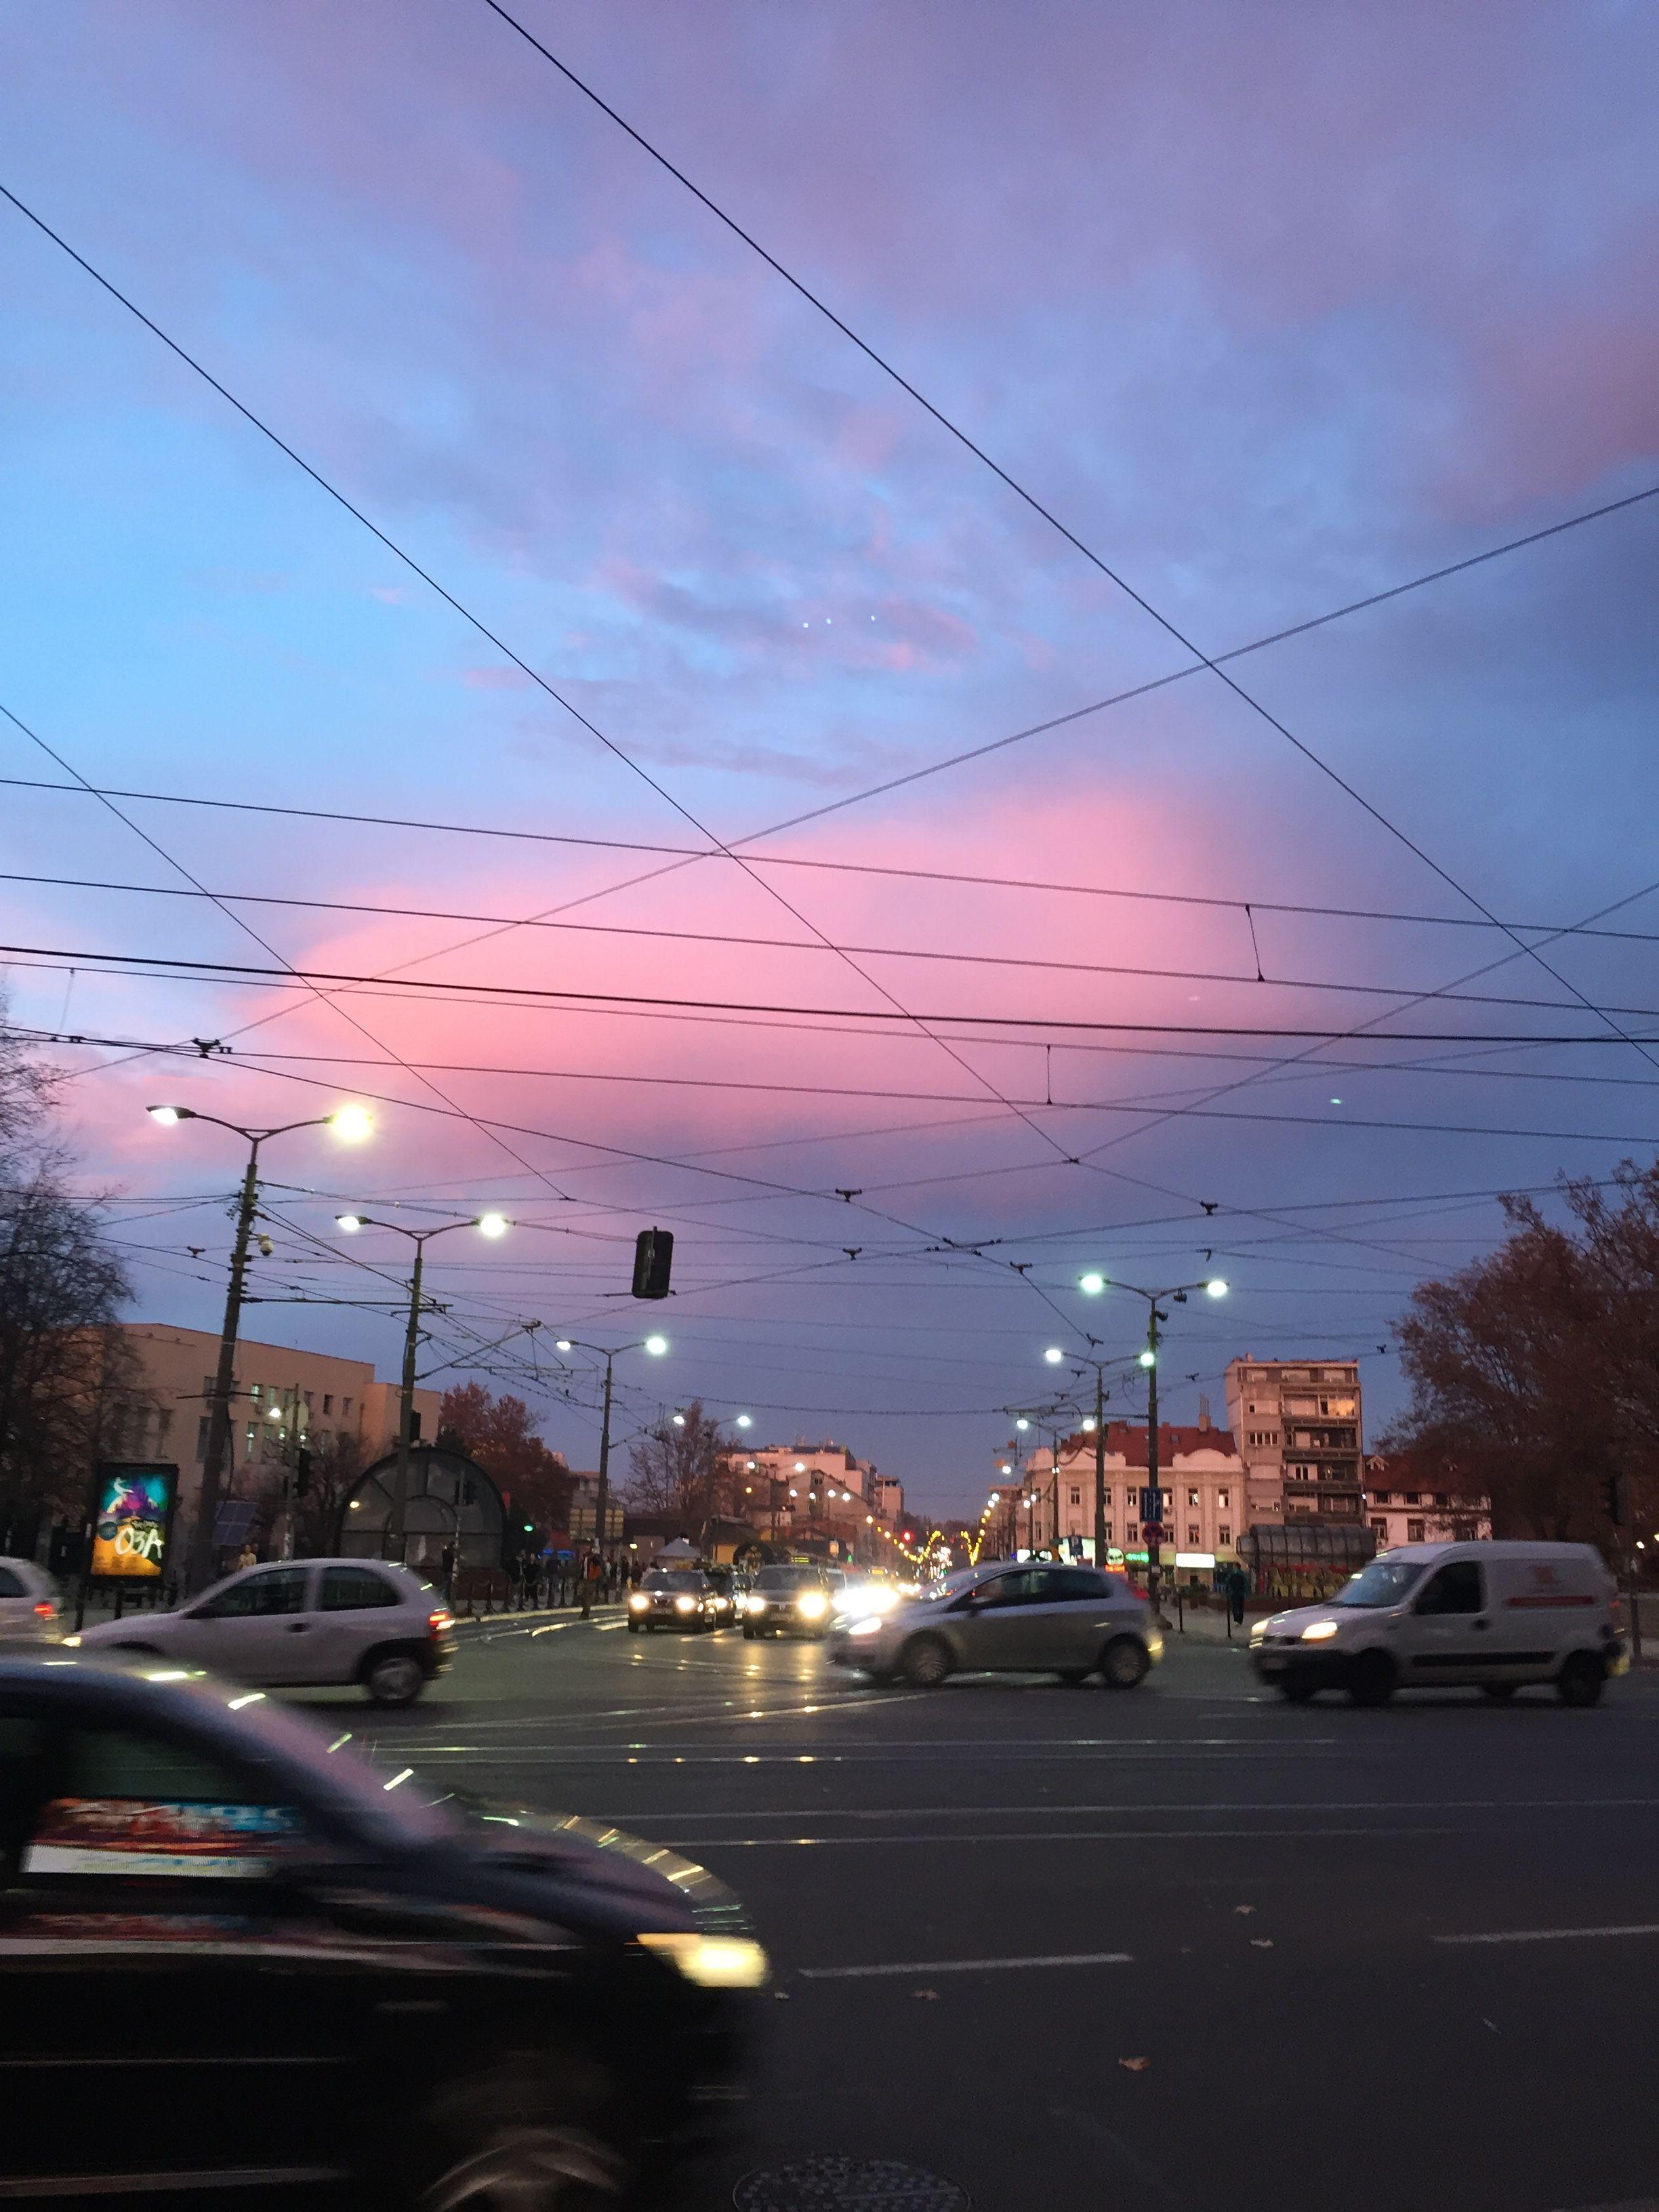 Sunset Sunset Celestial Outdoor